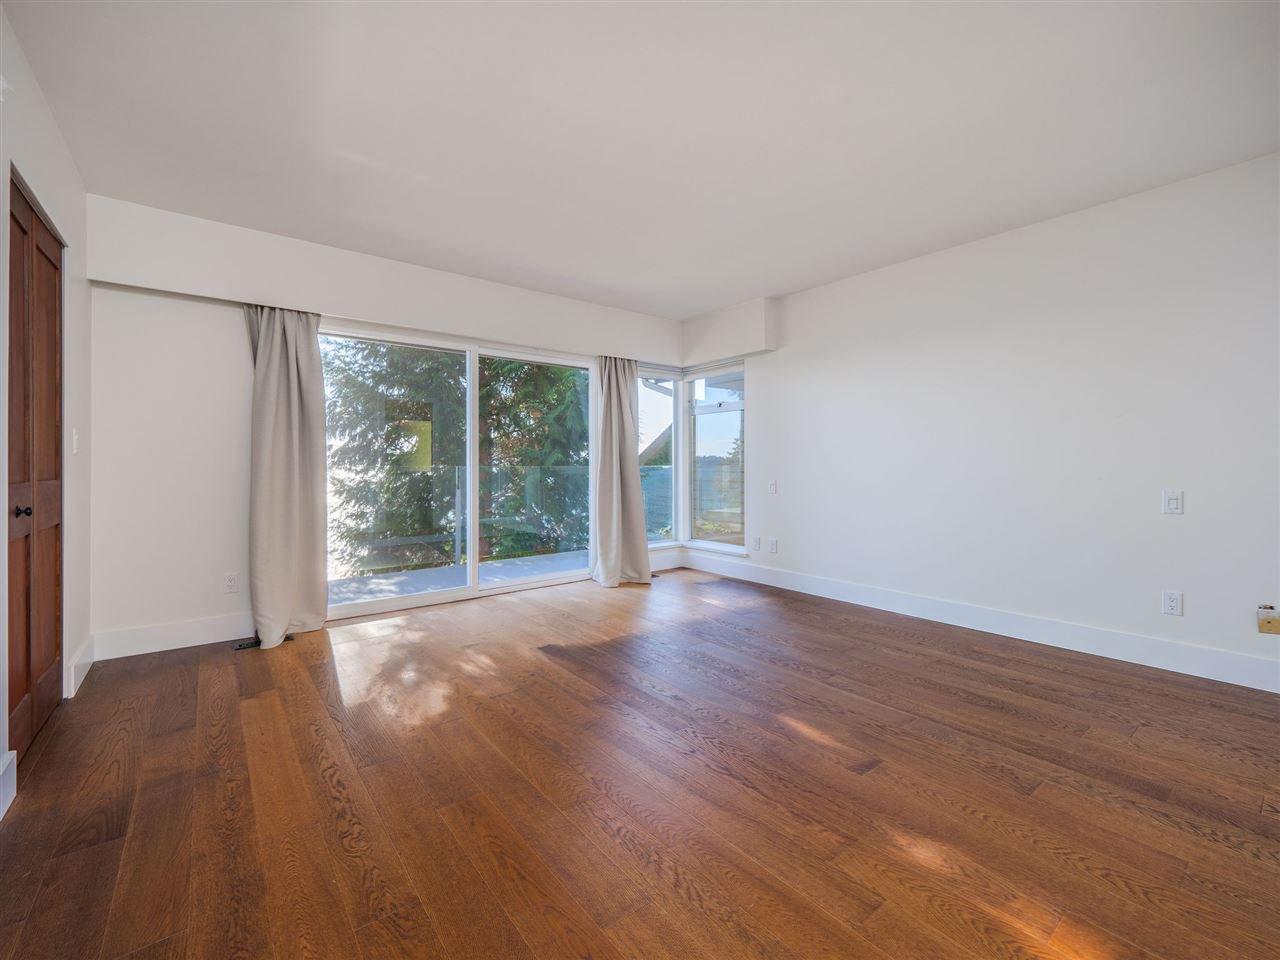 "Photo 24: Photos: 7101 DALE Road in Sechelt: Sechelt District House for sale in ""Caleda Estates"" (Sunshine Coast)  : MLS®# R2515160"